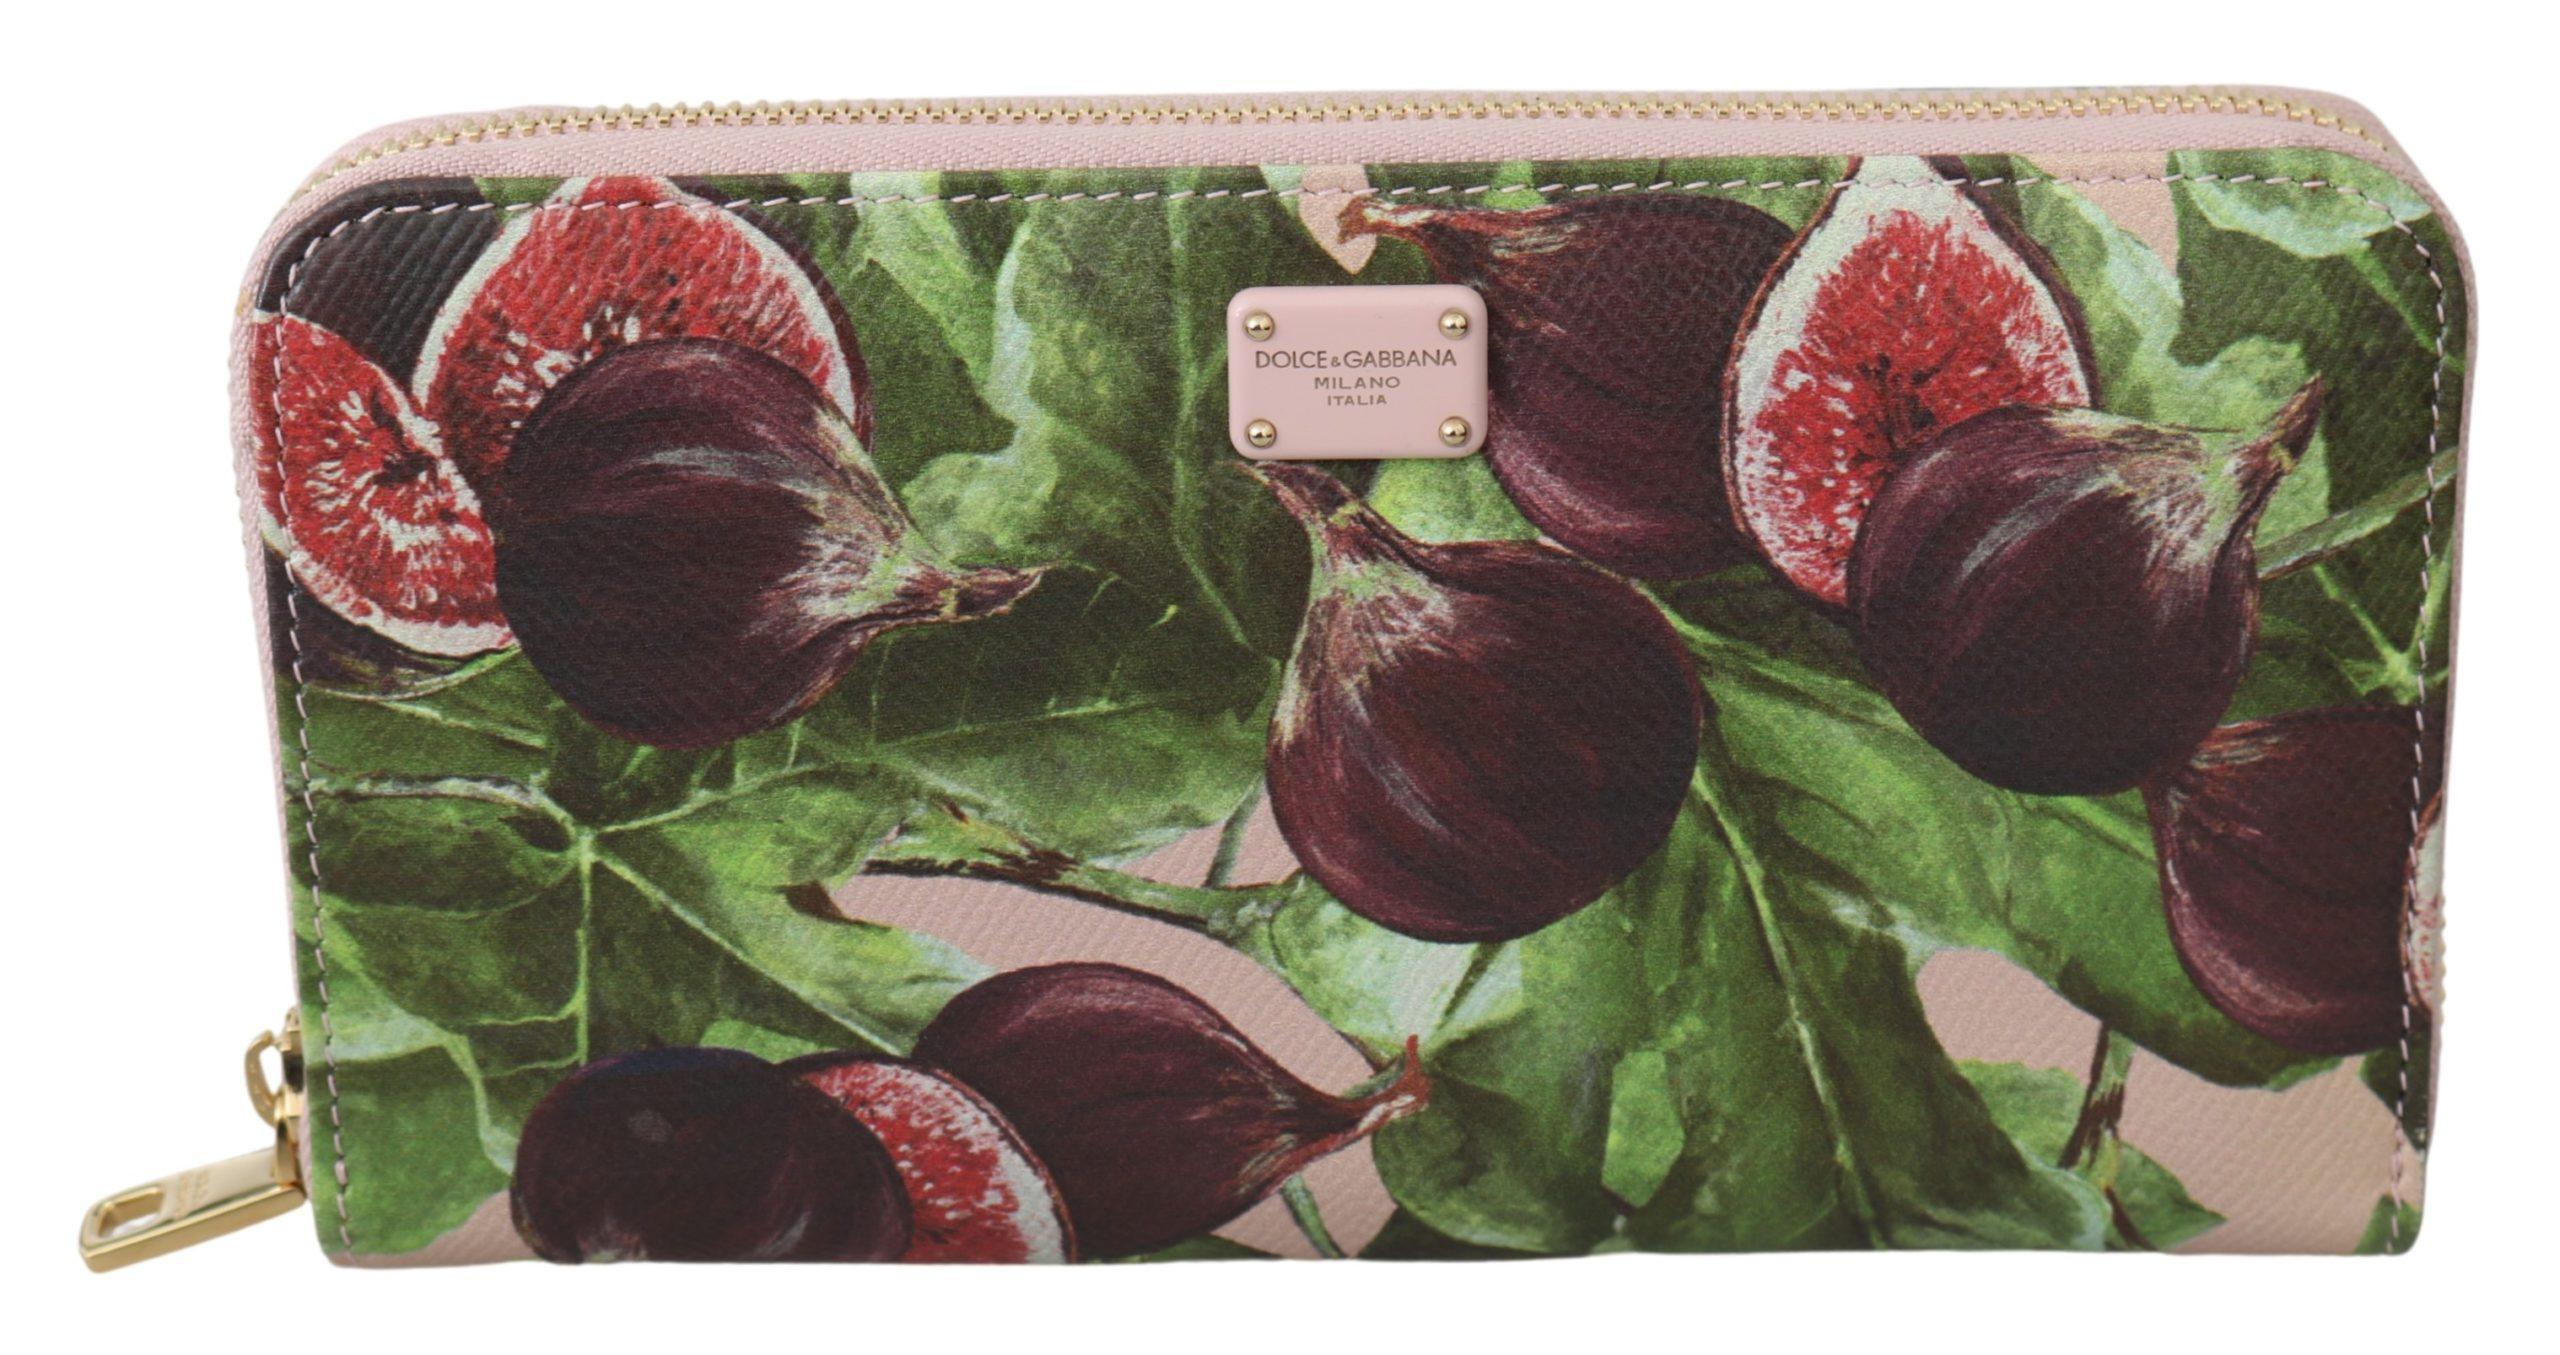 Dolce & Gabbana Women's Dauphine Leather Zipper Continental Wallet Multicolor VAS9707